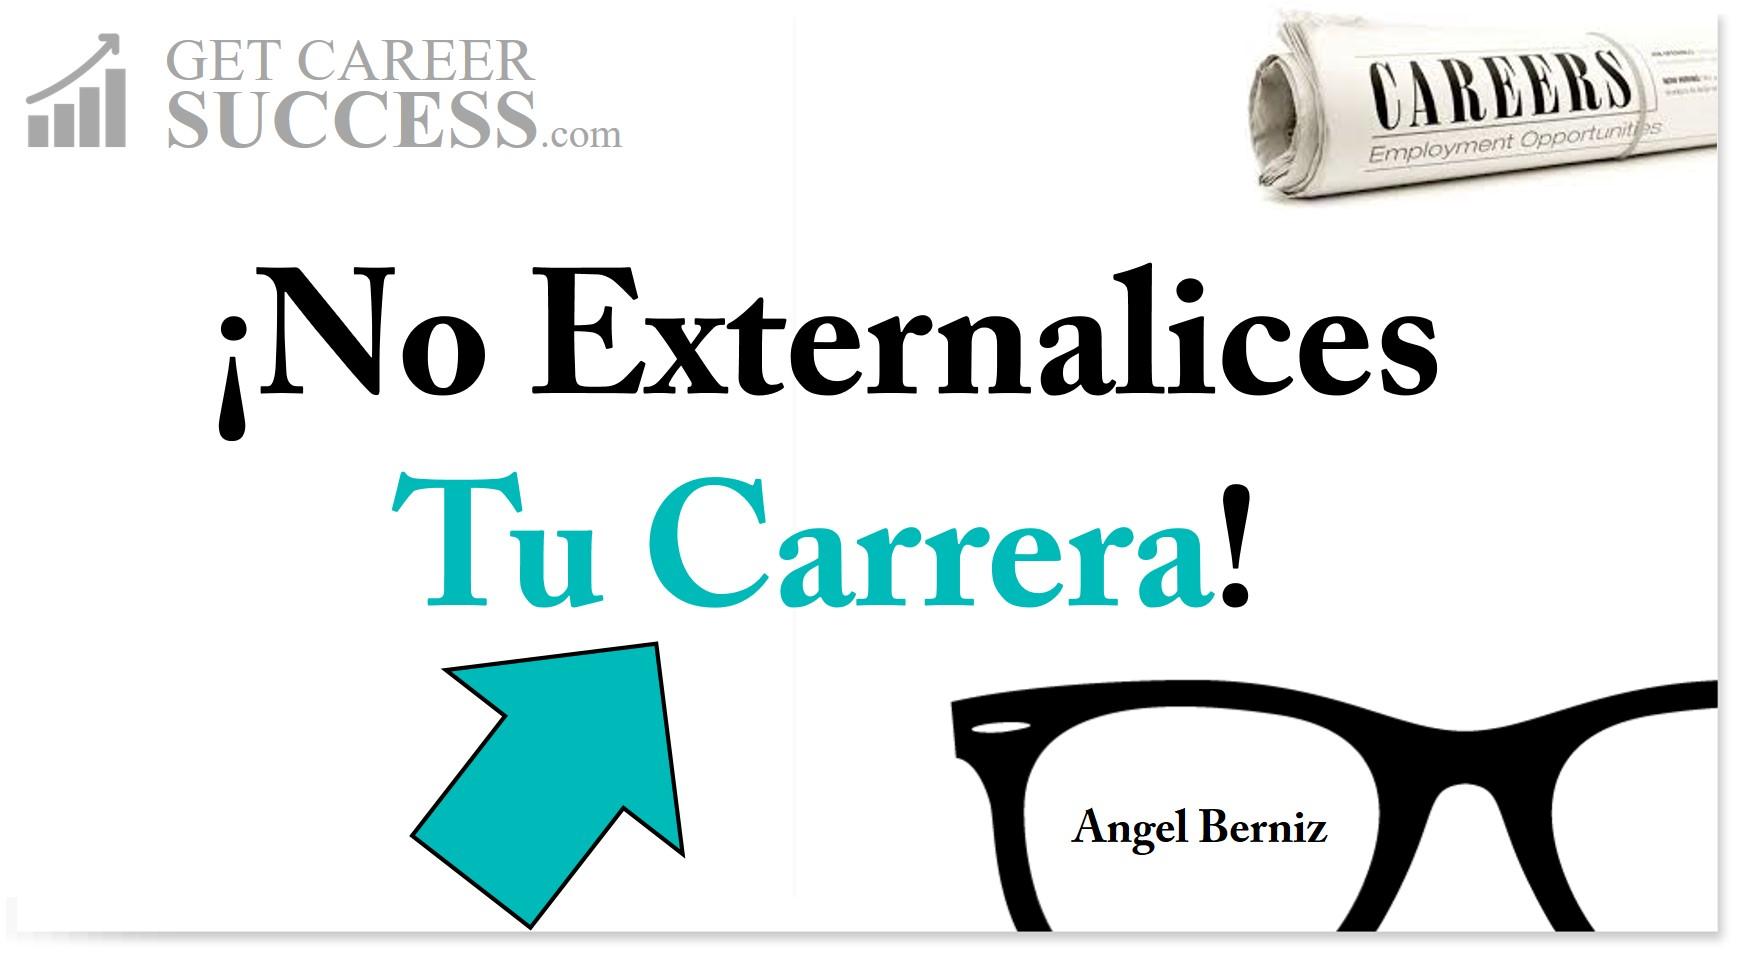 no-externalices-tu-carrera-coach-angel-berniz